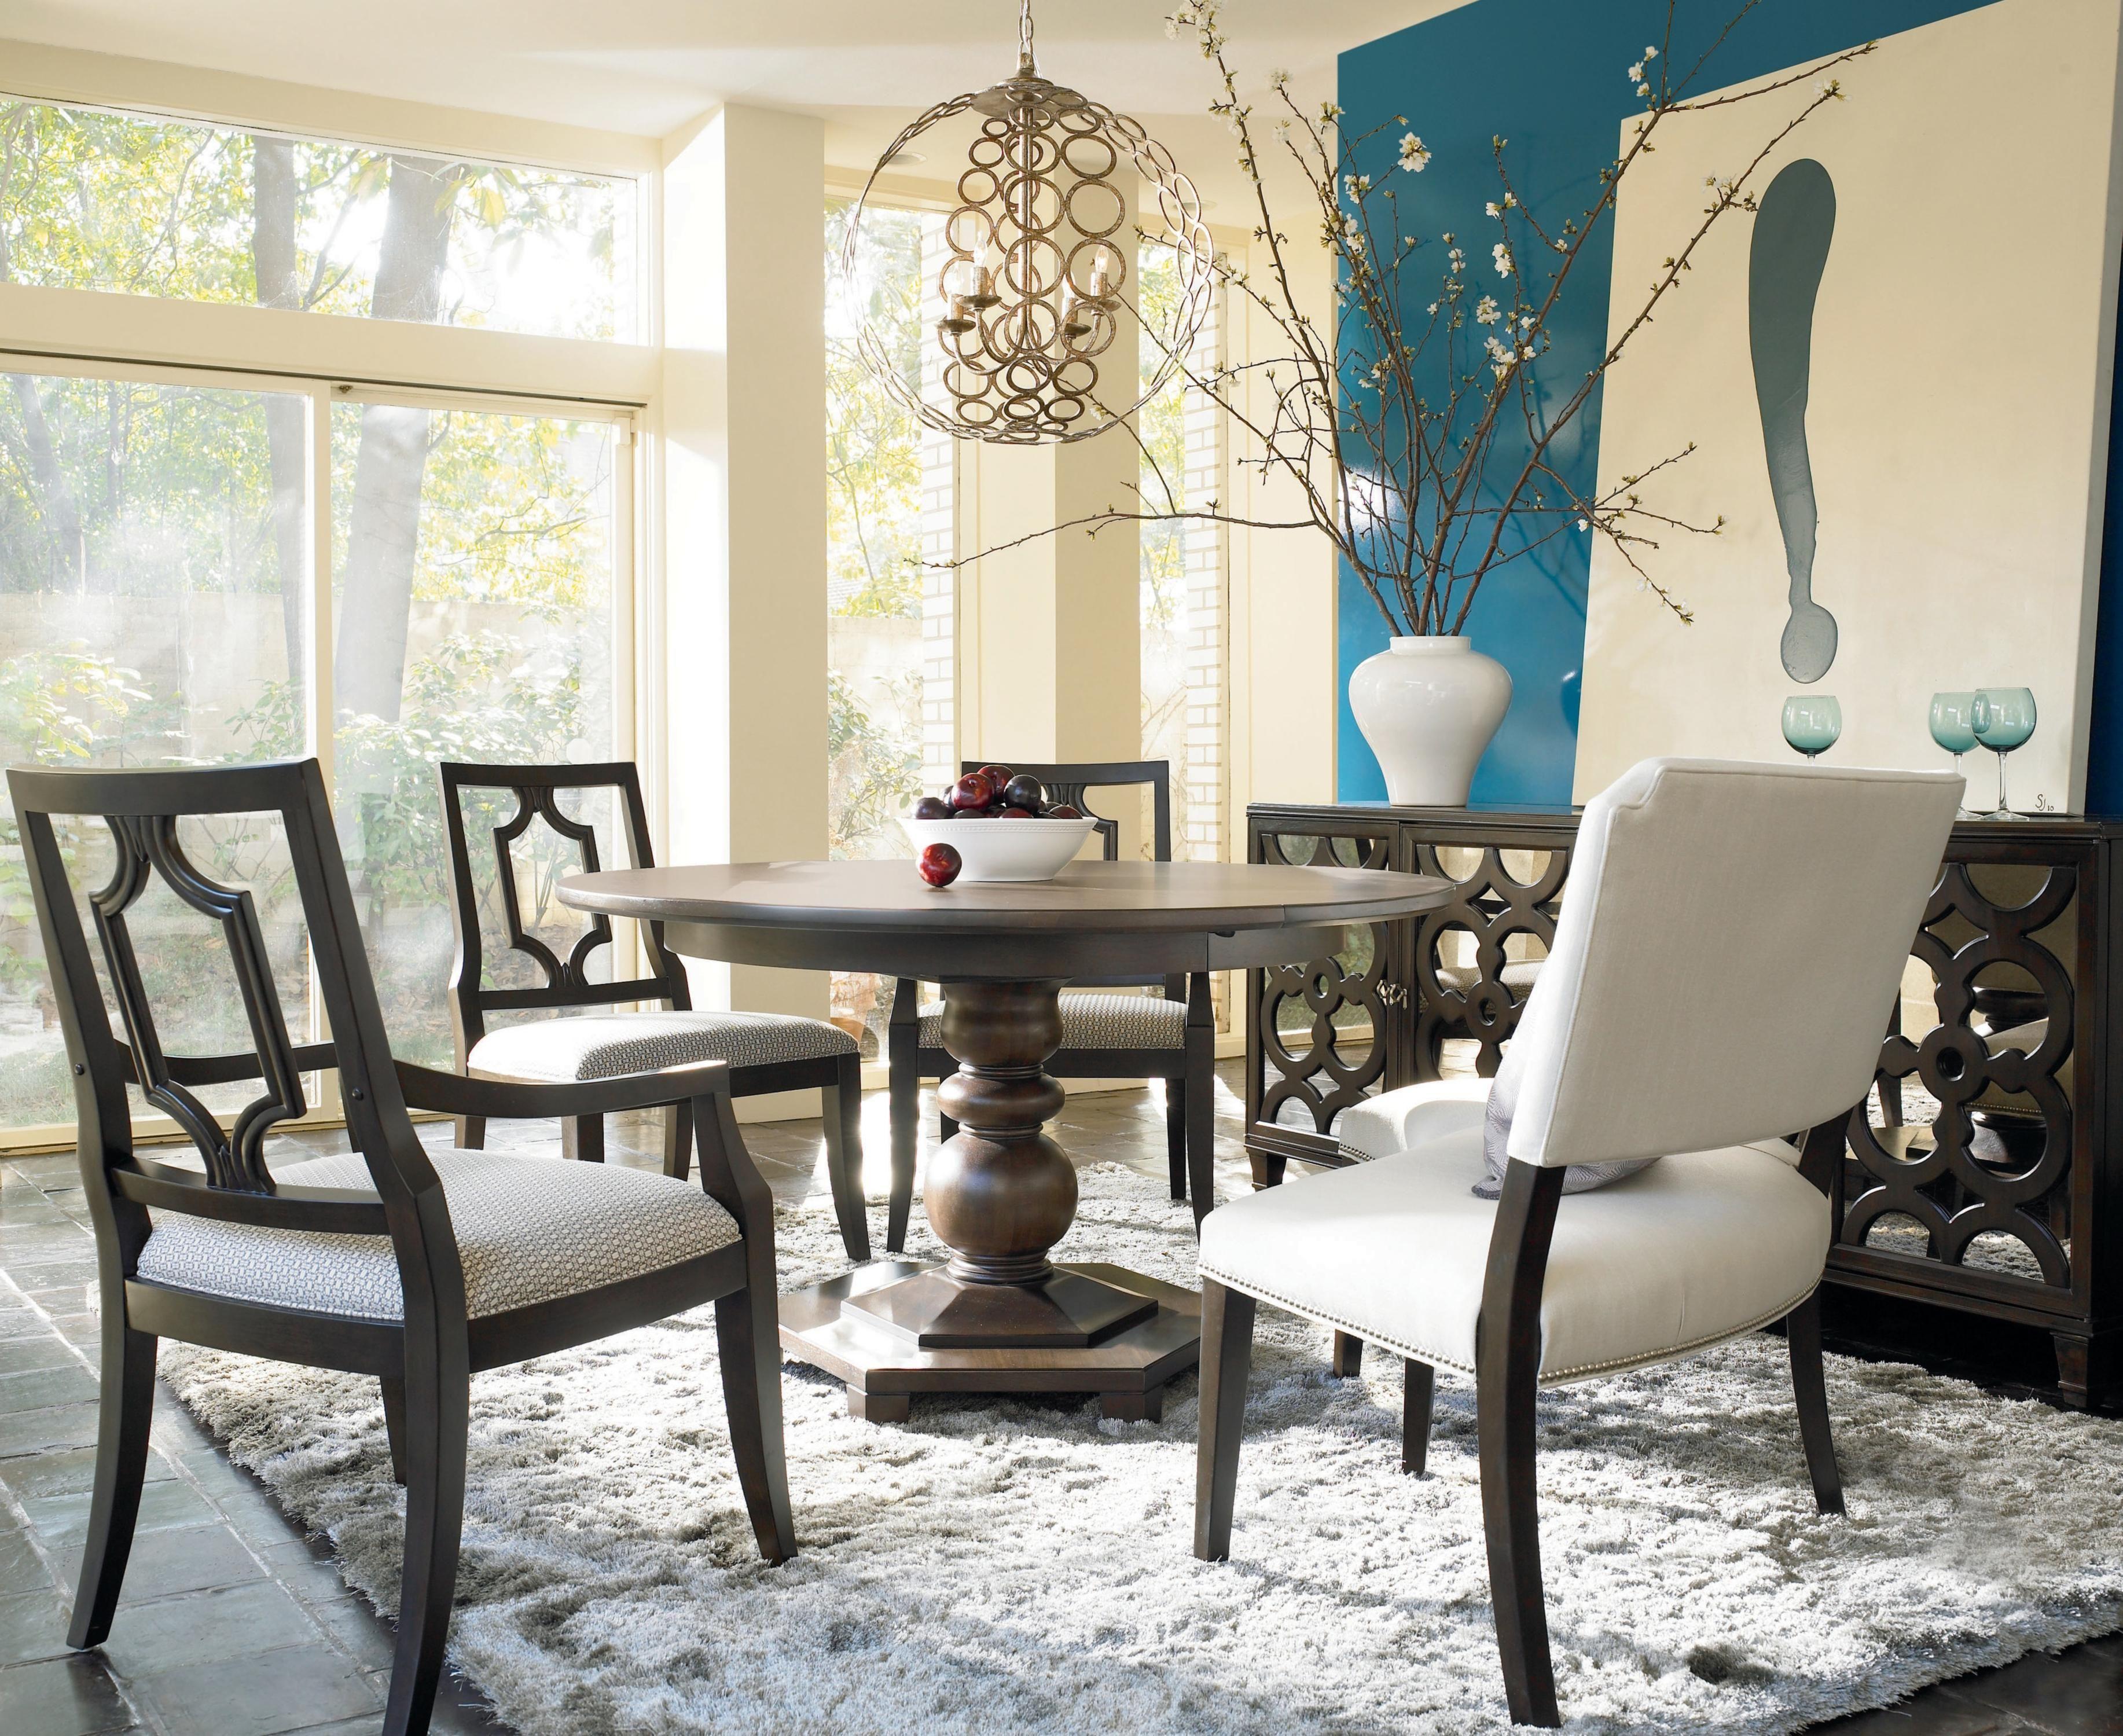 Dalliance 470Drexel Heritage®  Sprintz Furniture  Drexel Endearing Drexel Heritage Dining Room Inspiration